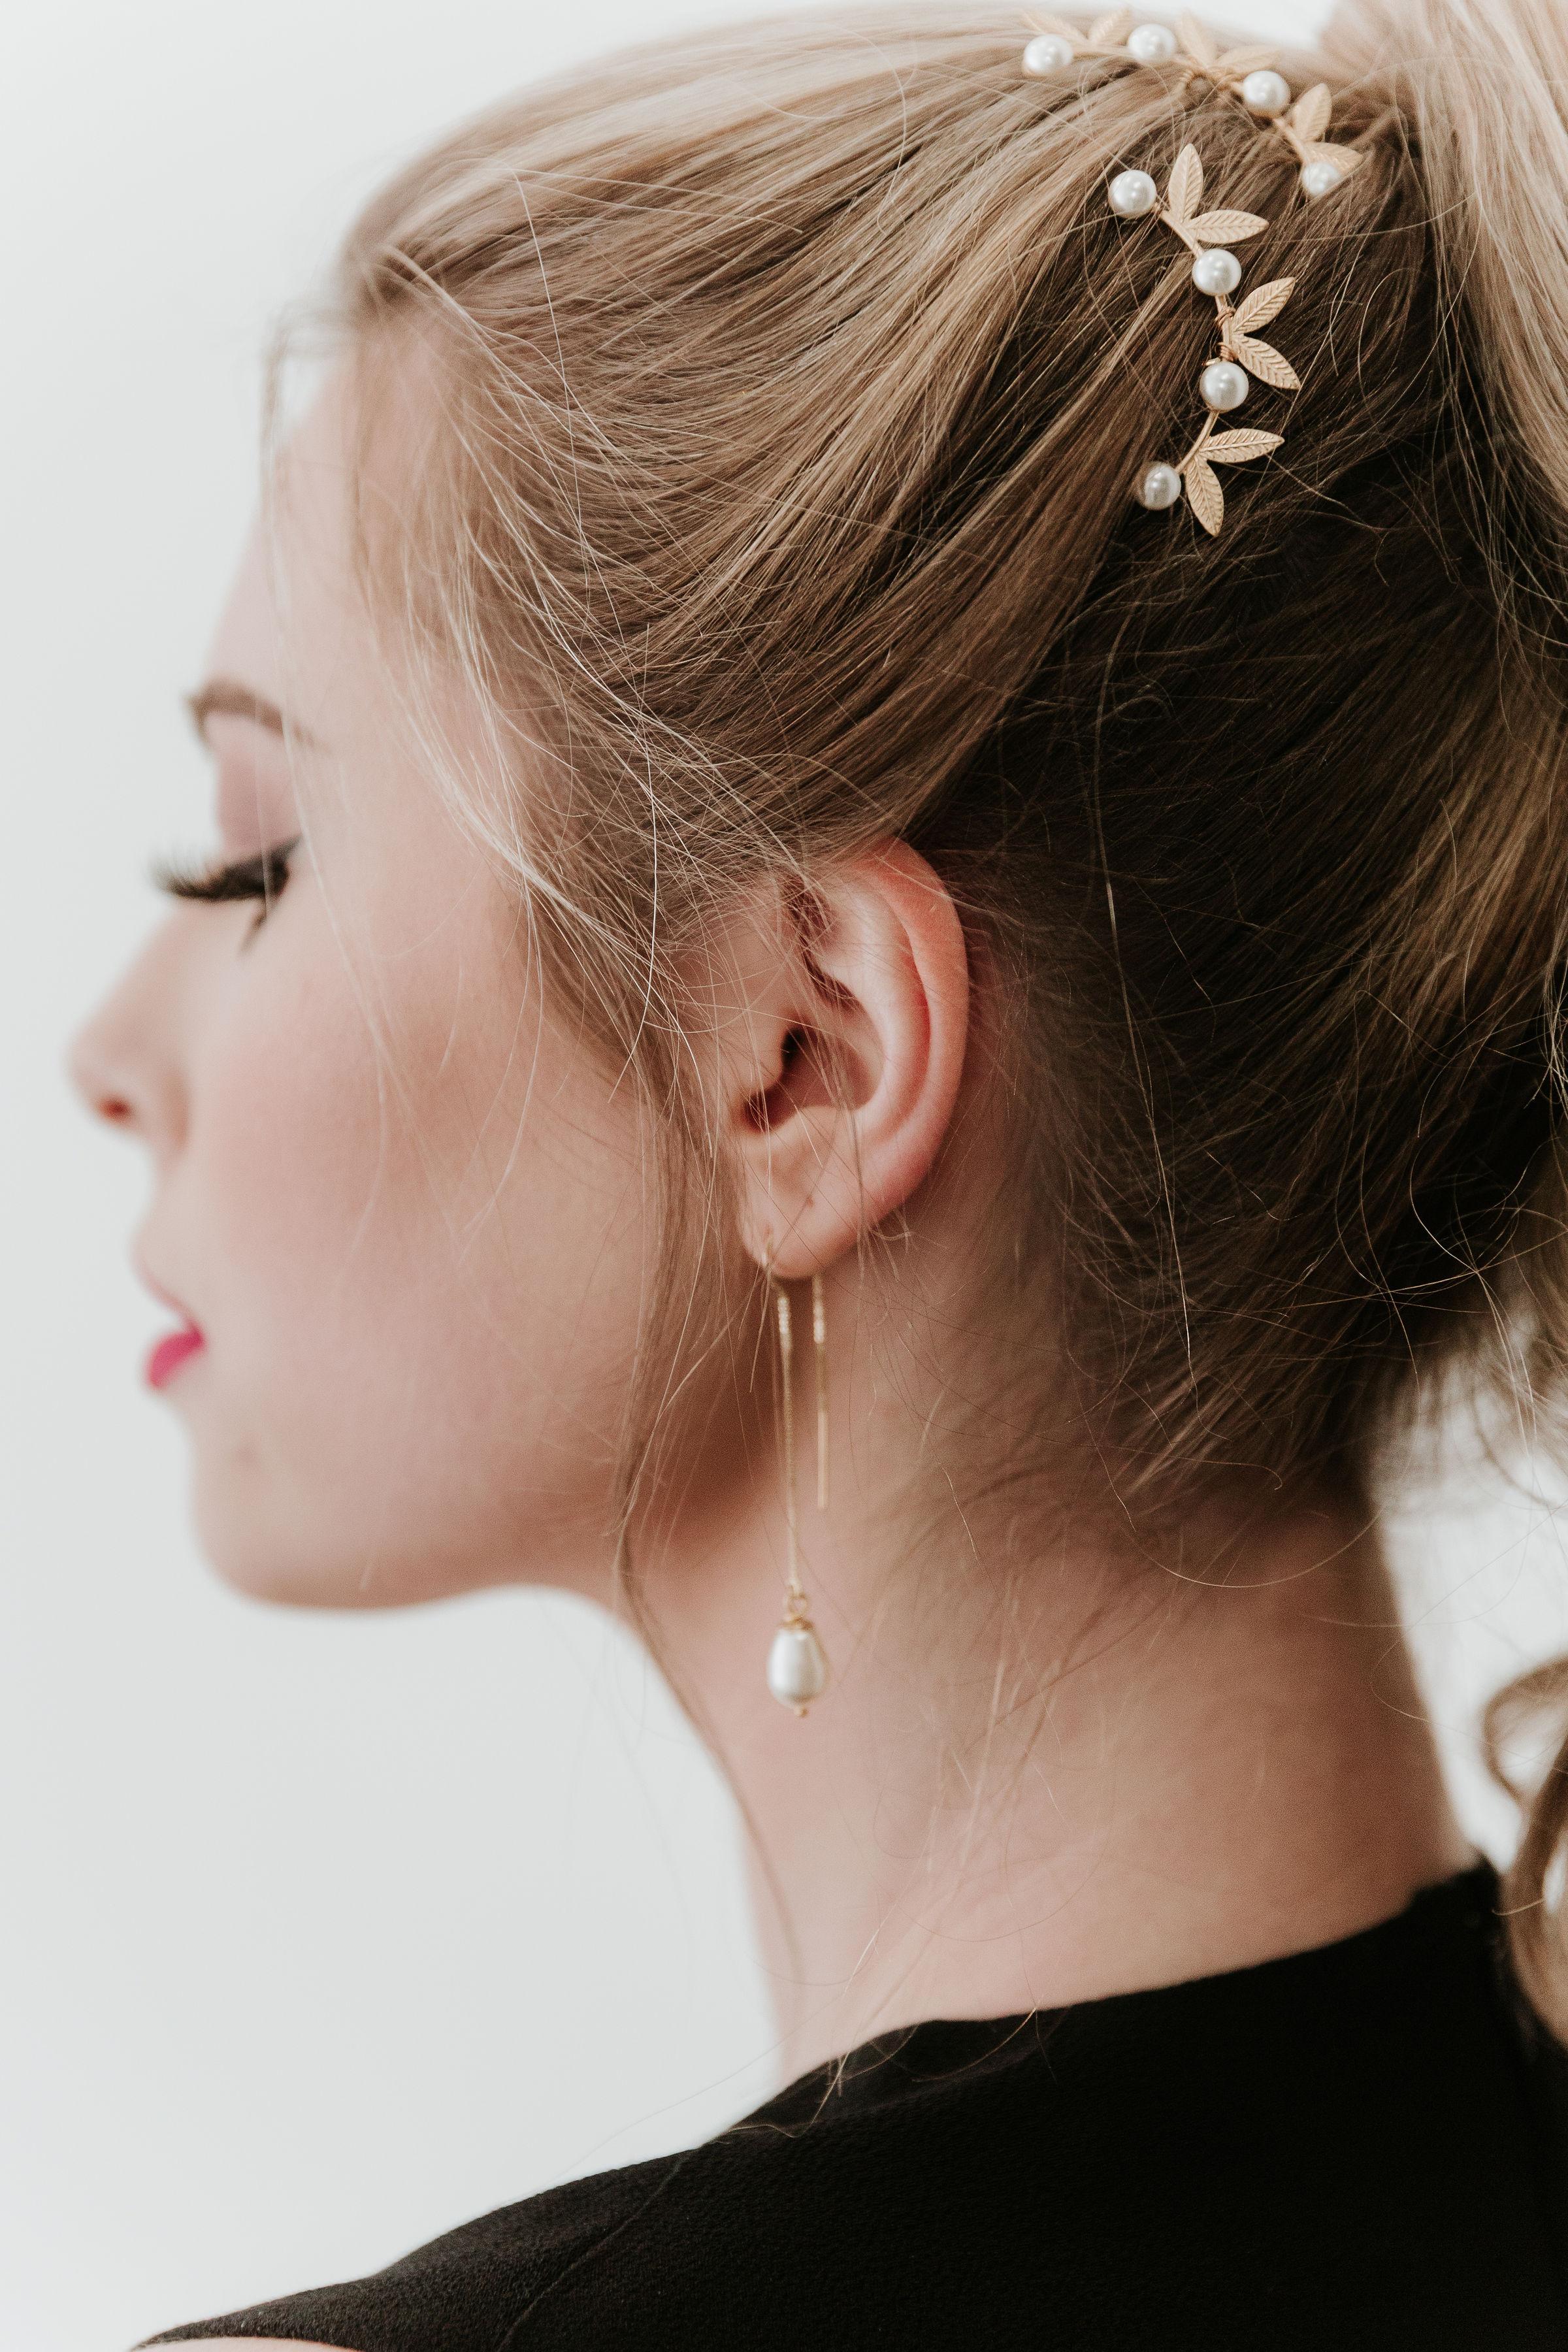 Jewelry - Joanna Bisley Designs